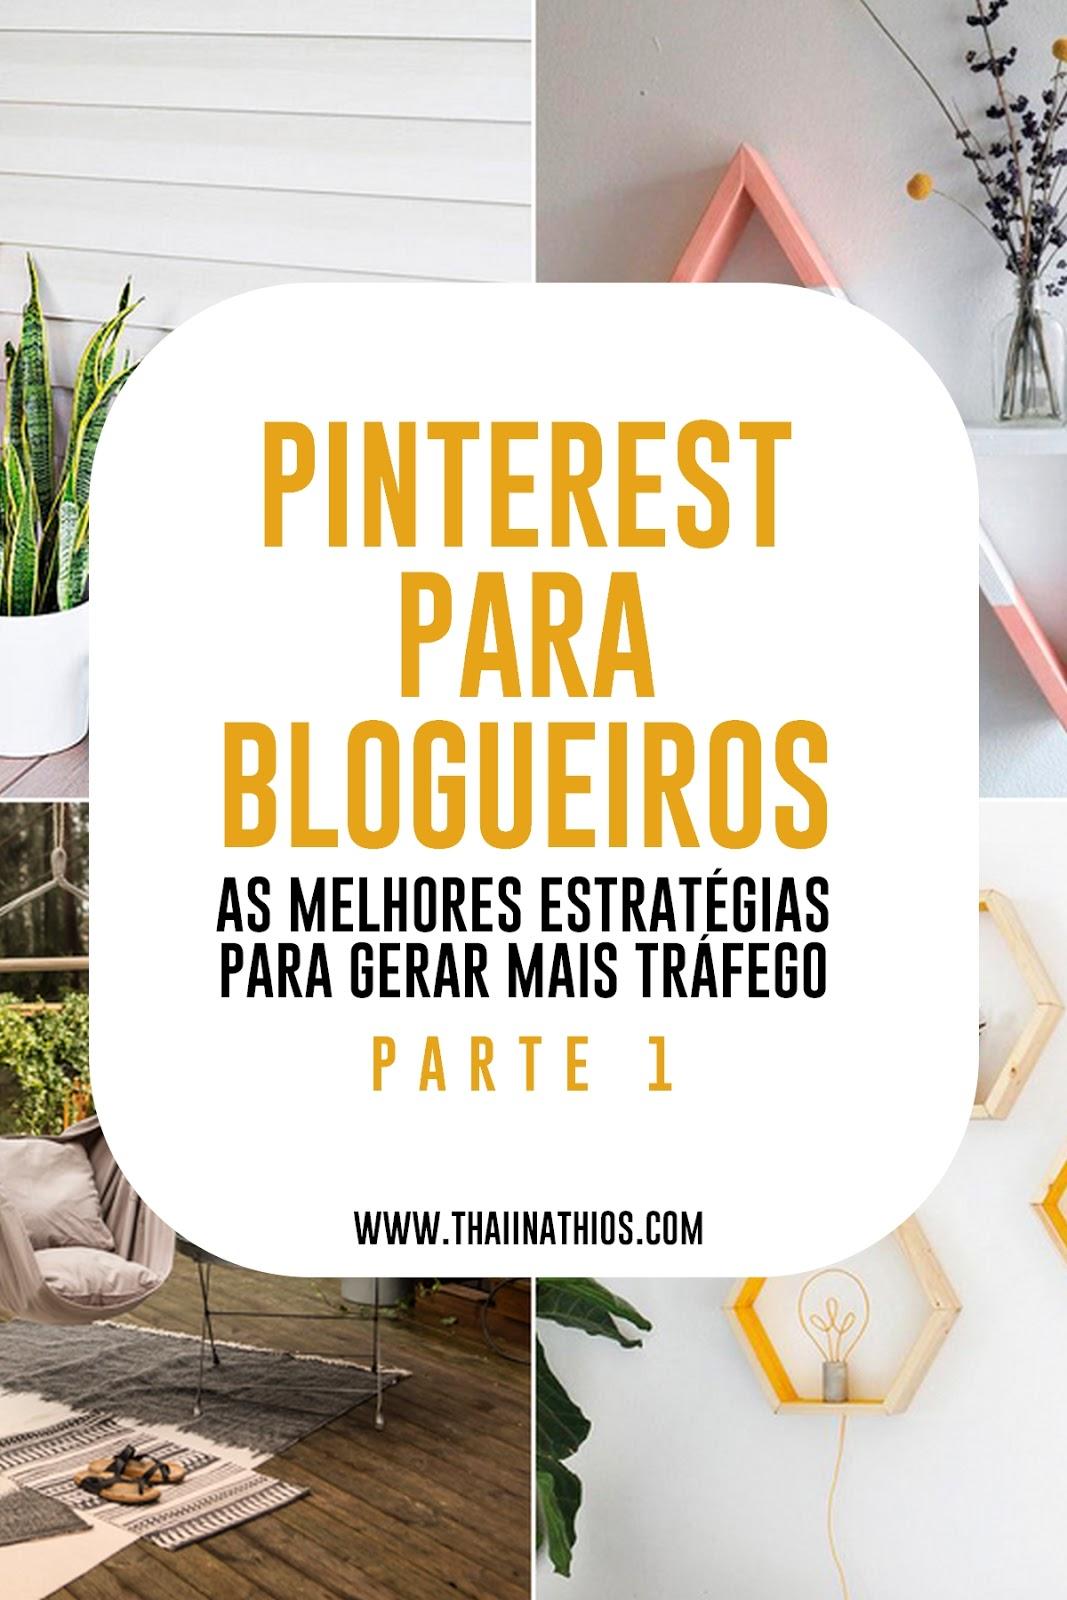 Pinterest para Blogueiros